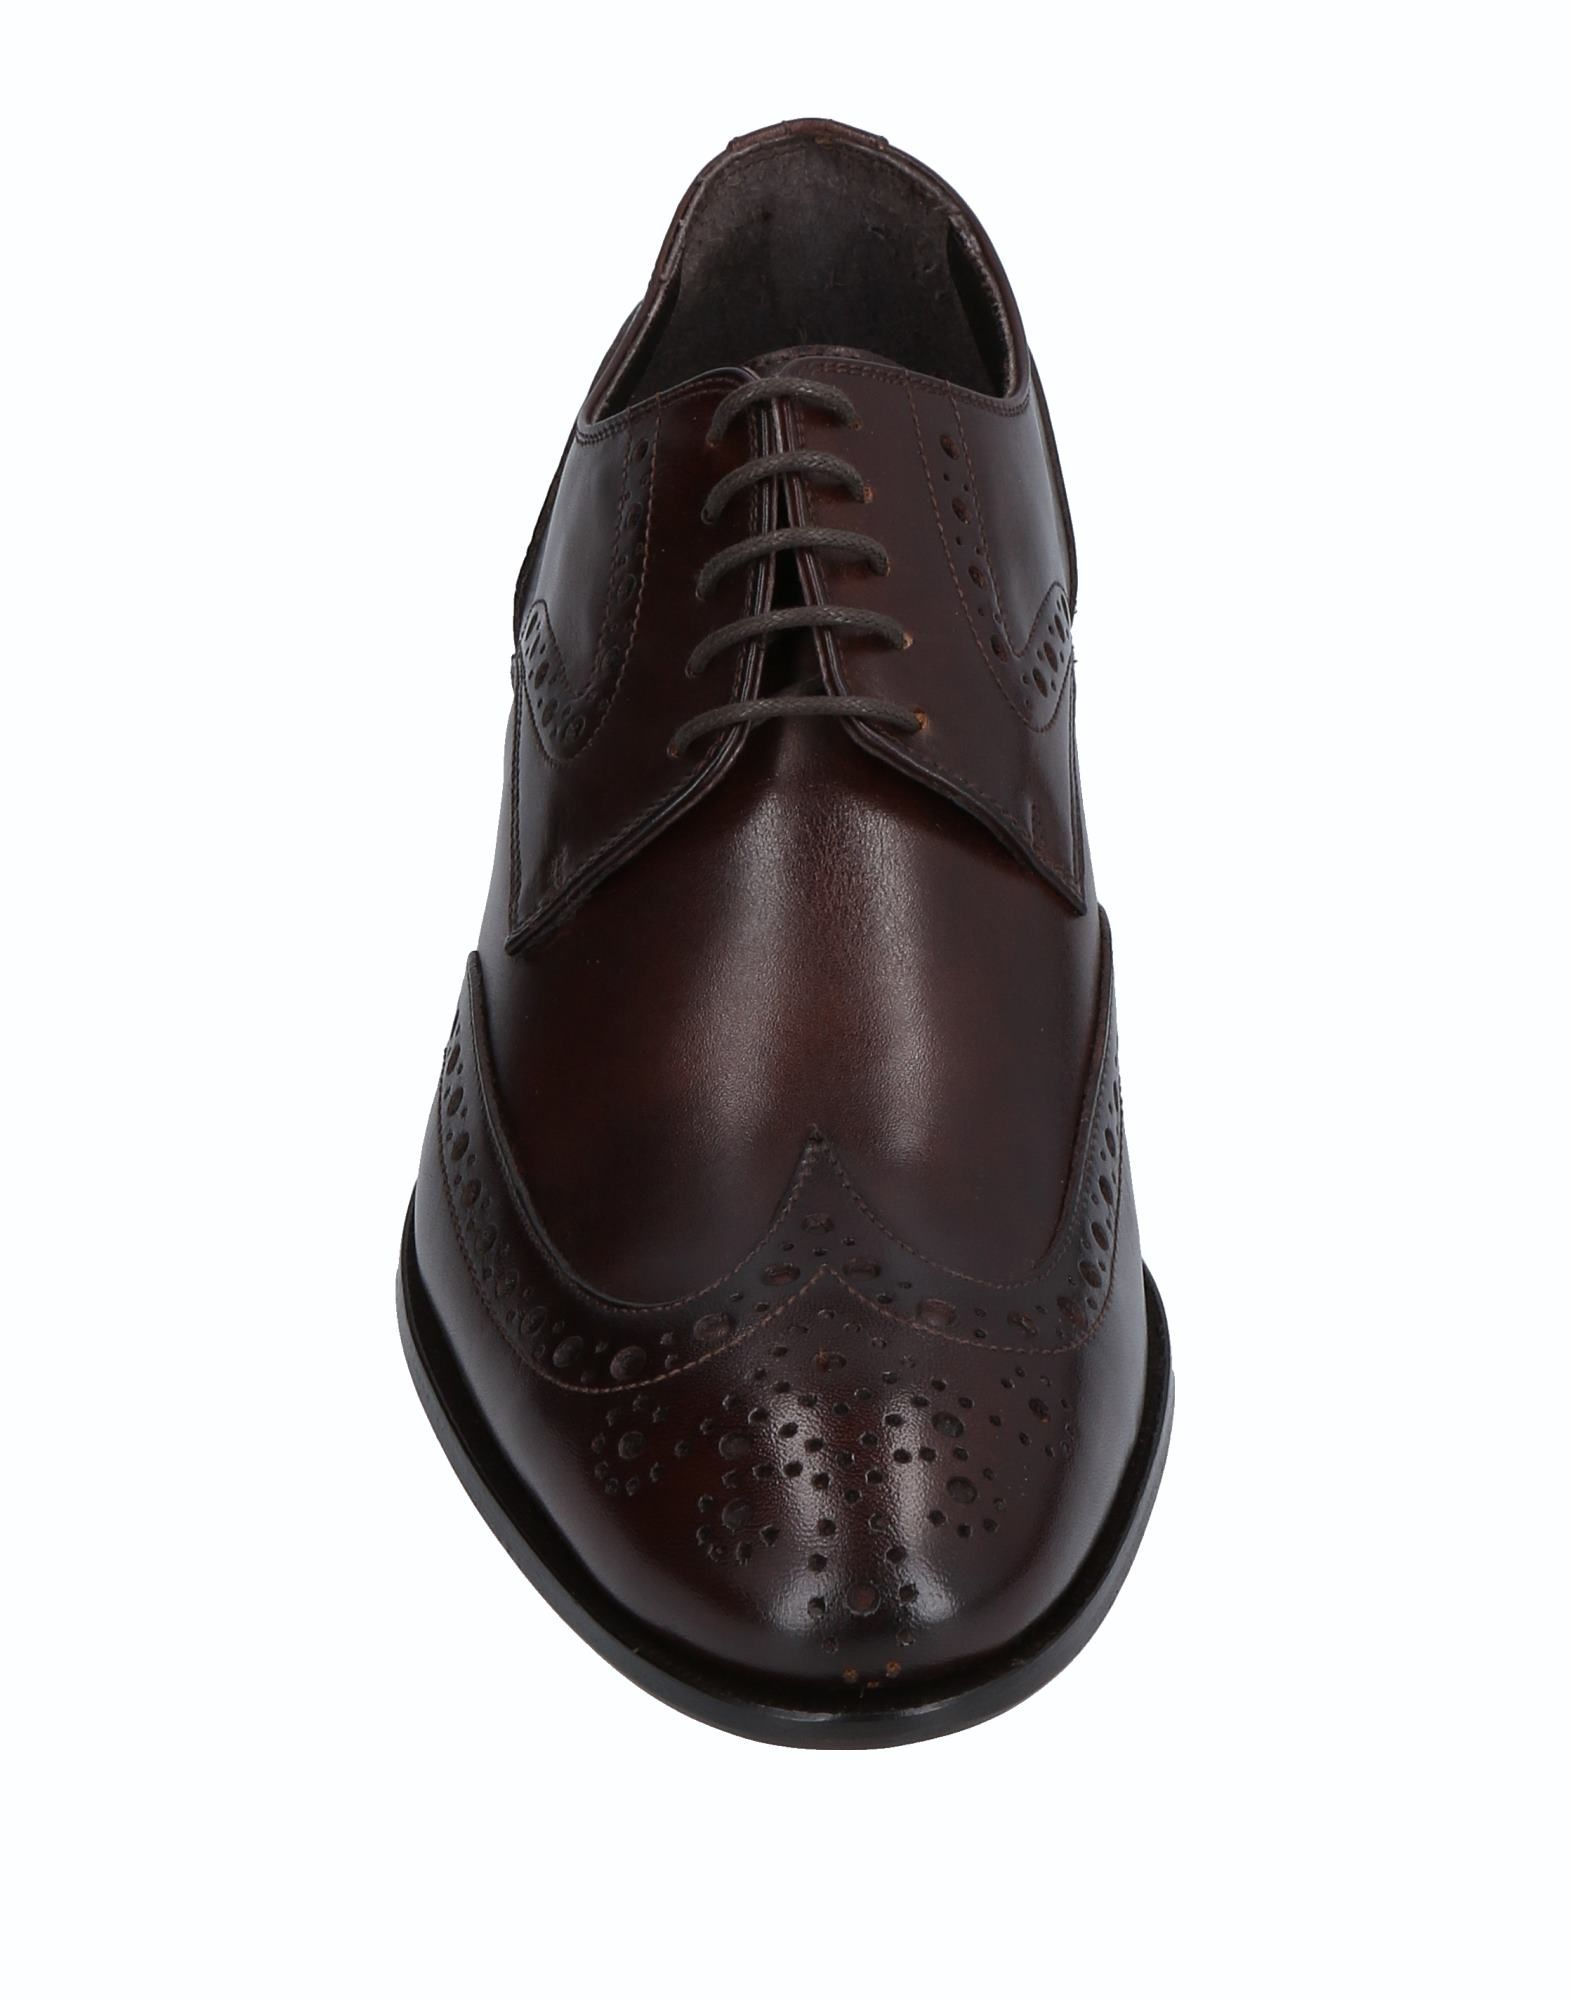 Bagatt Schnürschuhe Herren  11514315OF Gute Qualität beliebte Schuhe